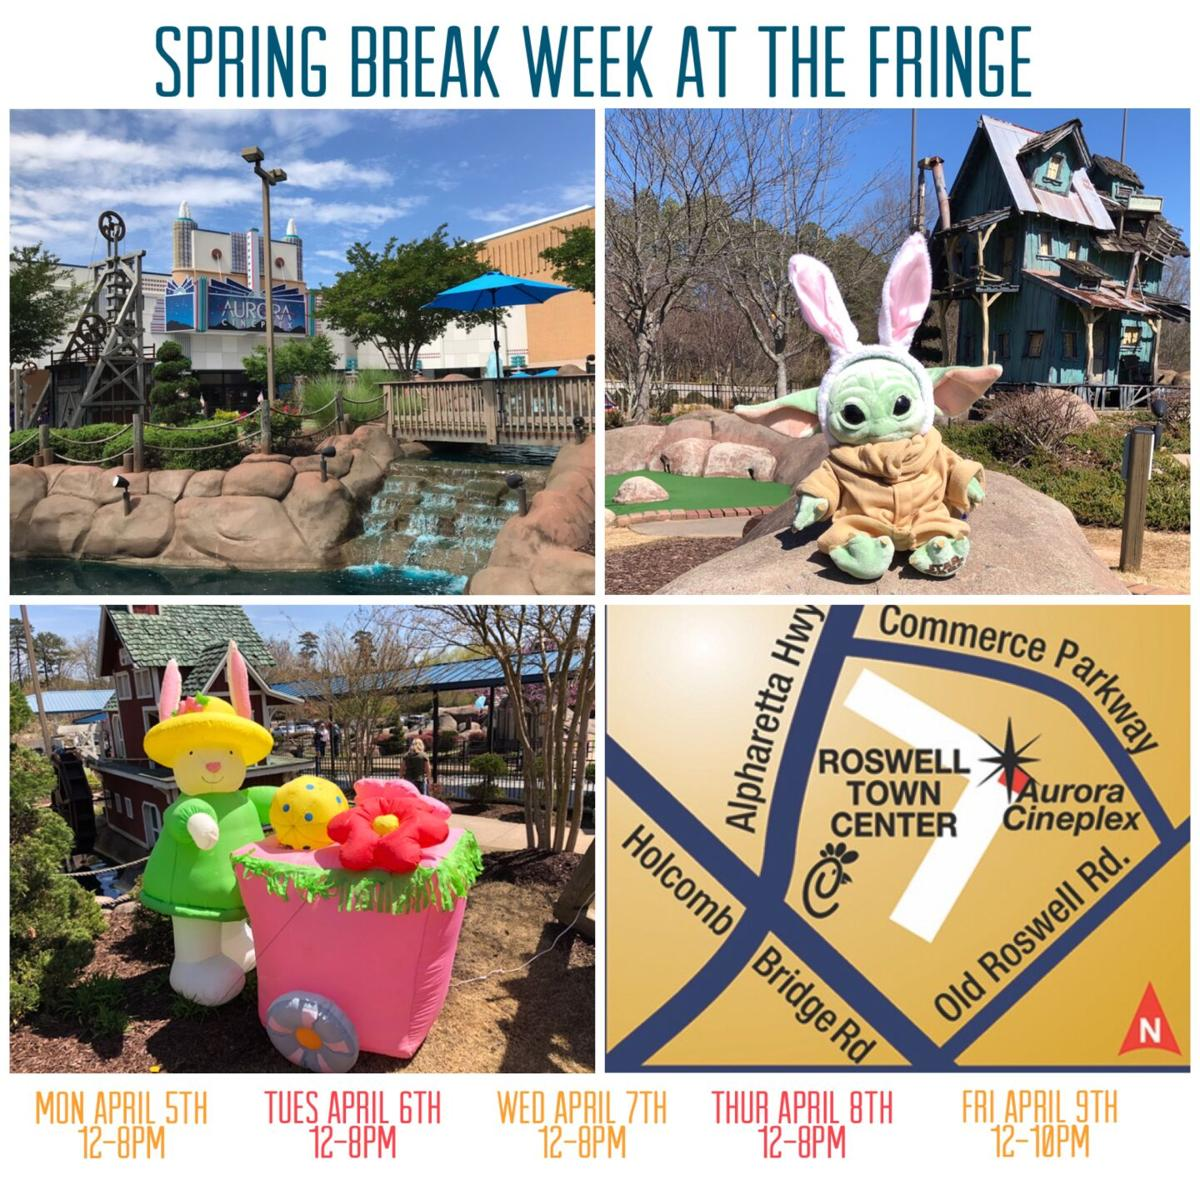 Spring Break Week at The Fringe